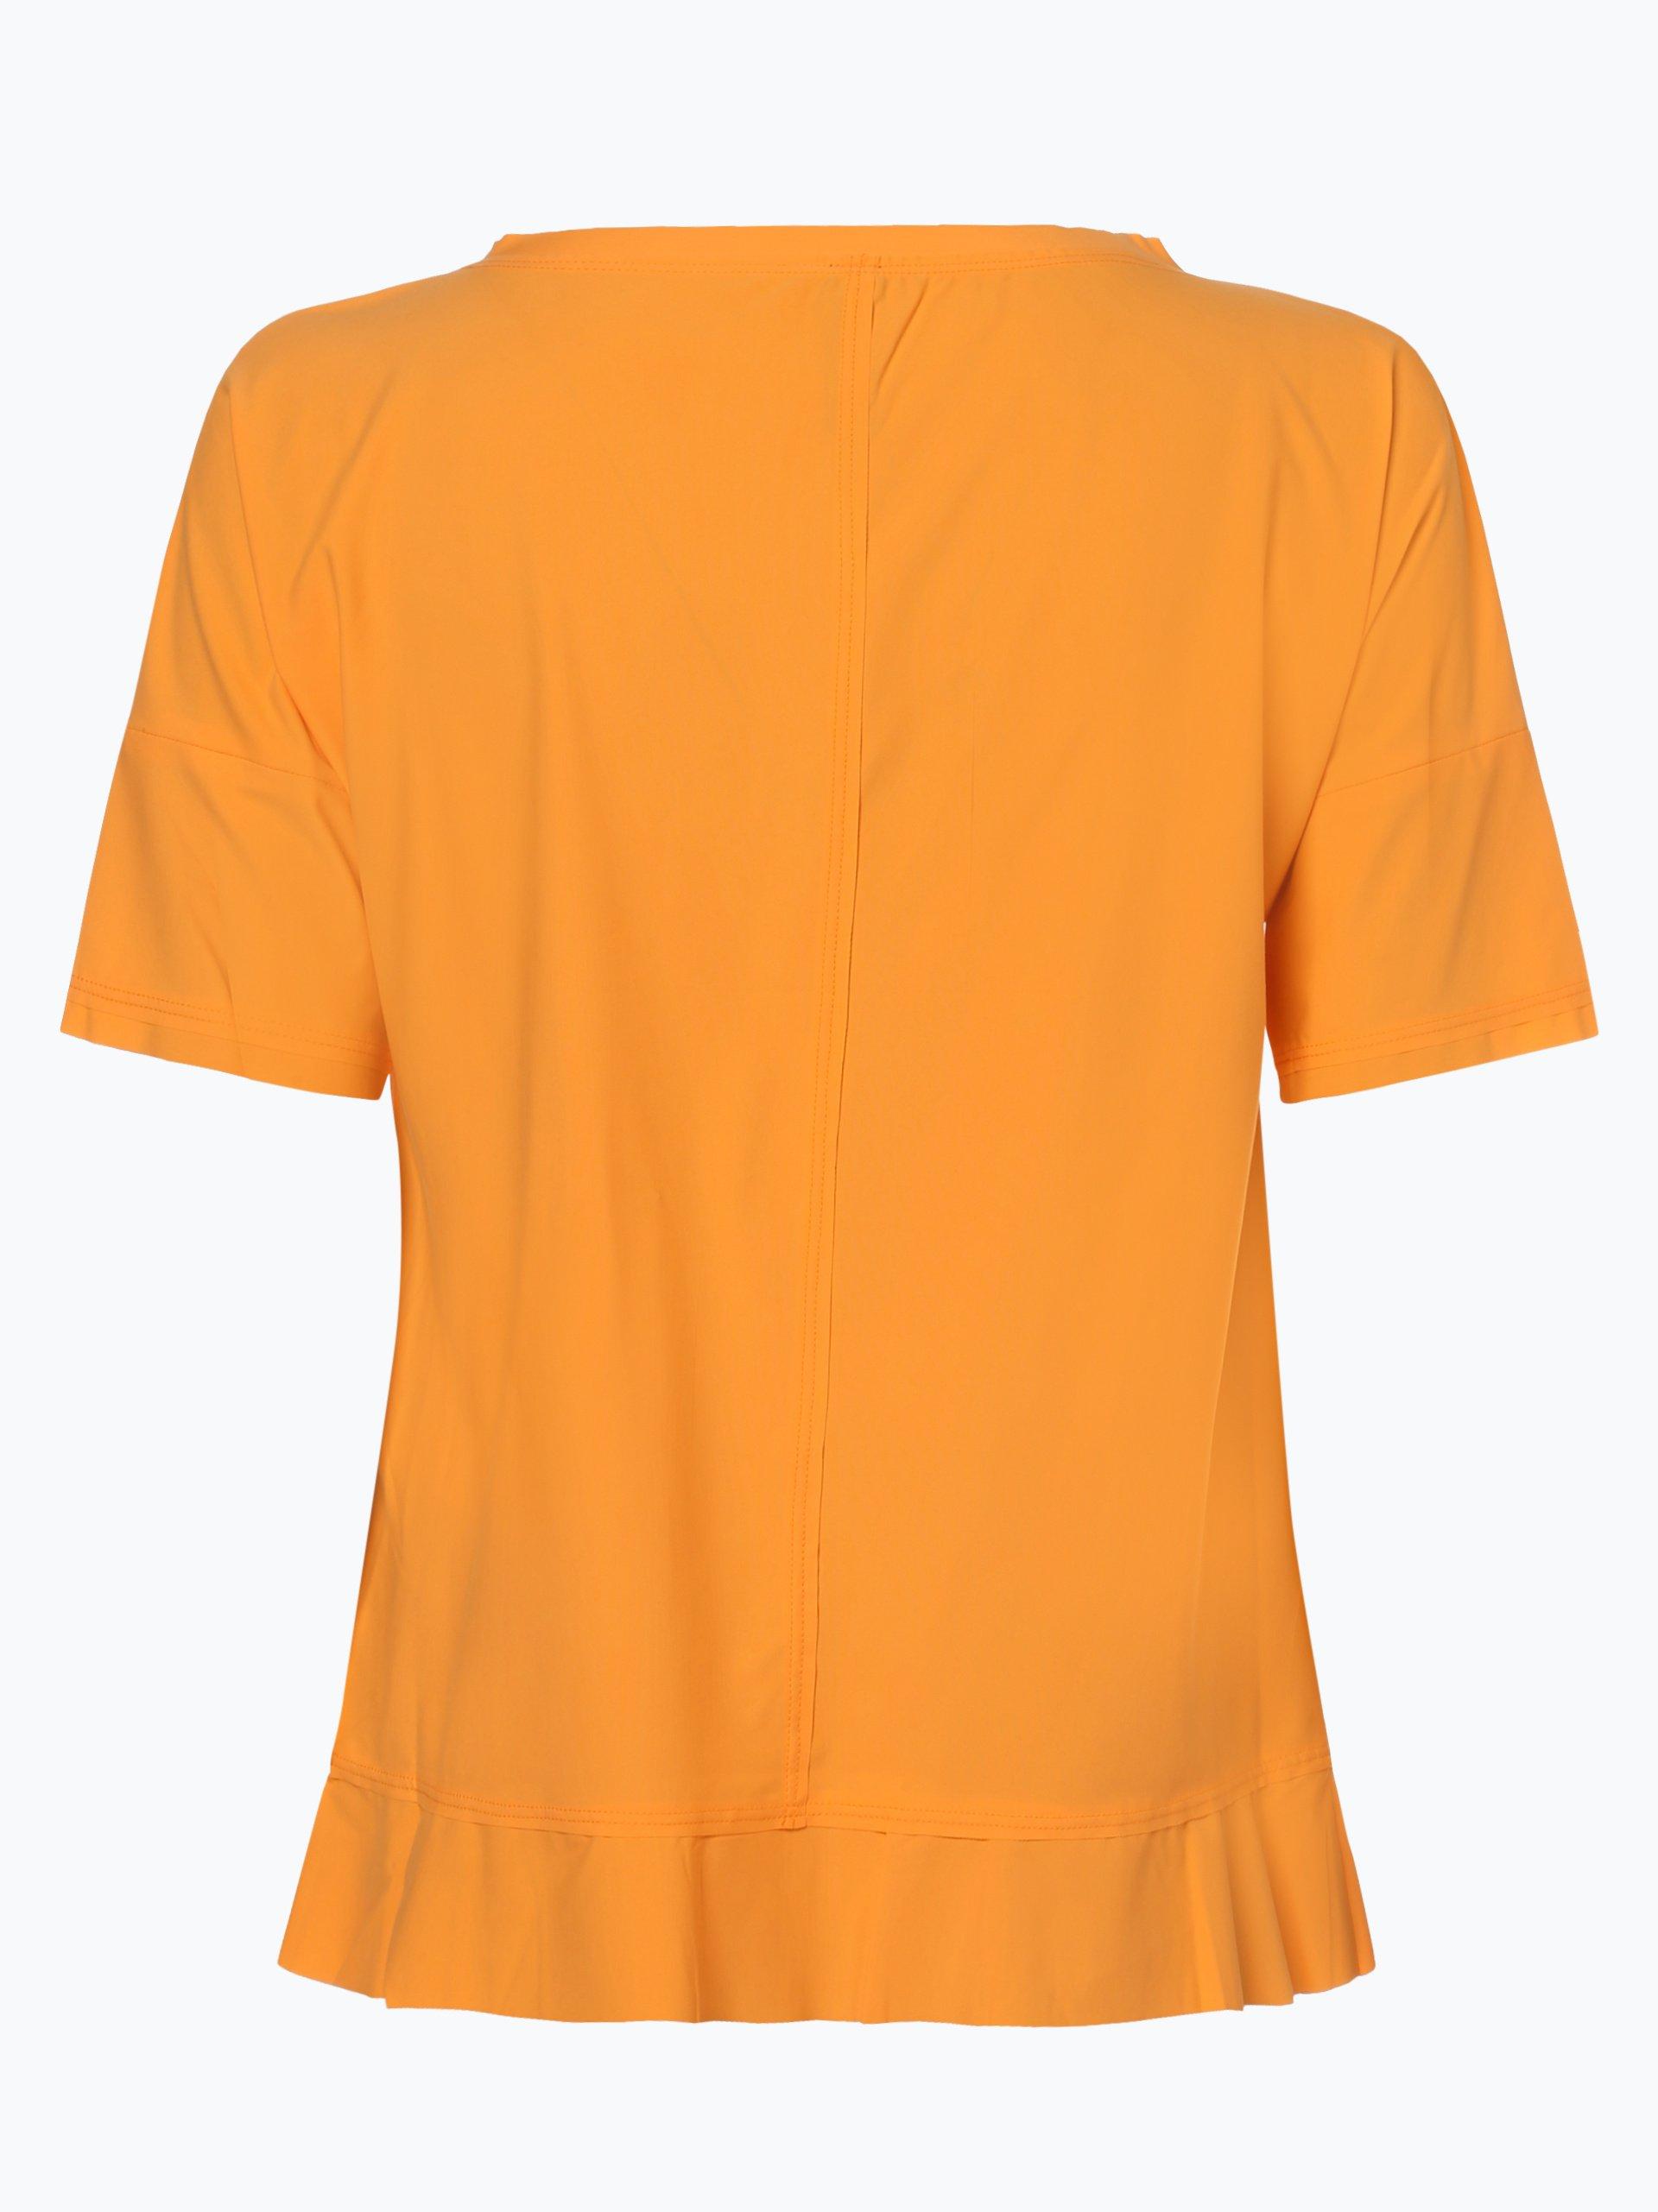 Marc Cain Collections Damen Blusenshirt